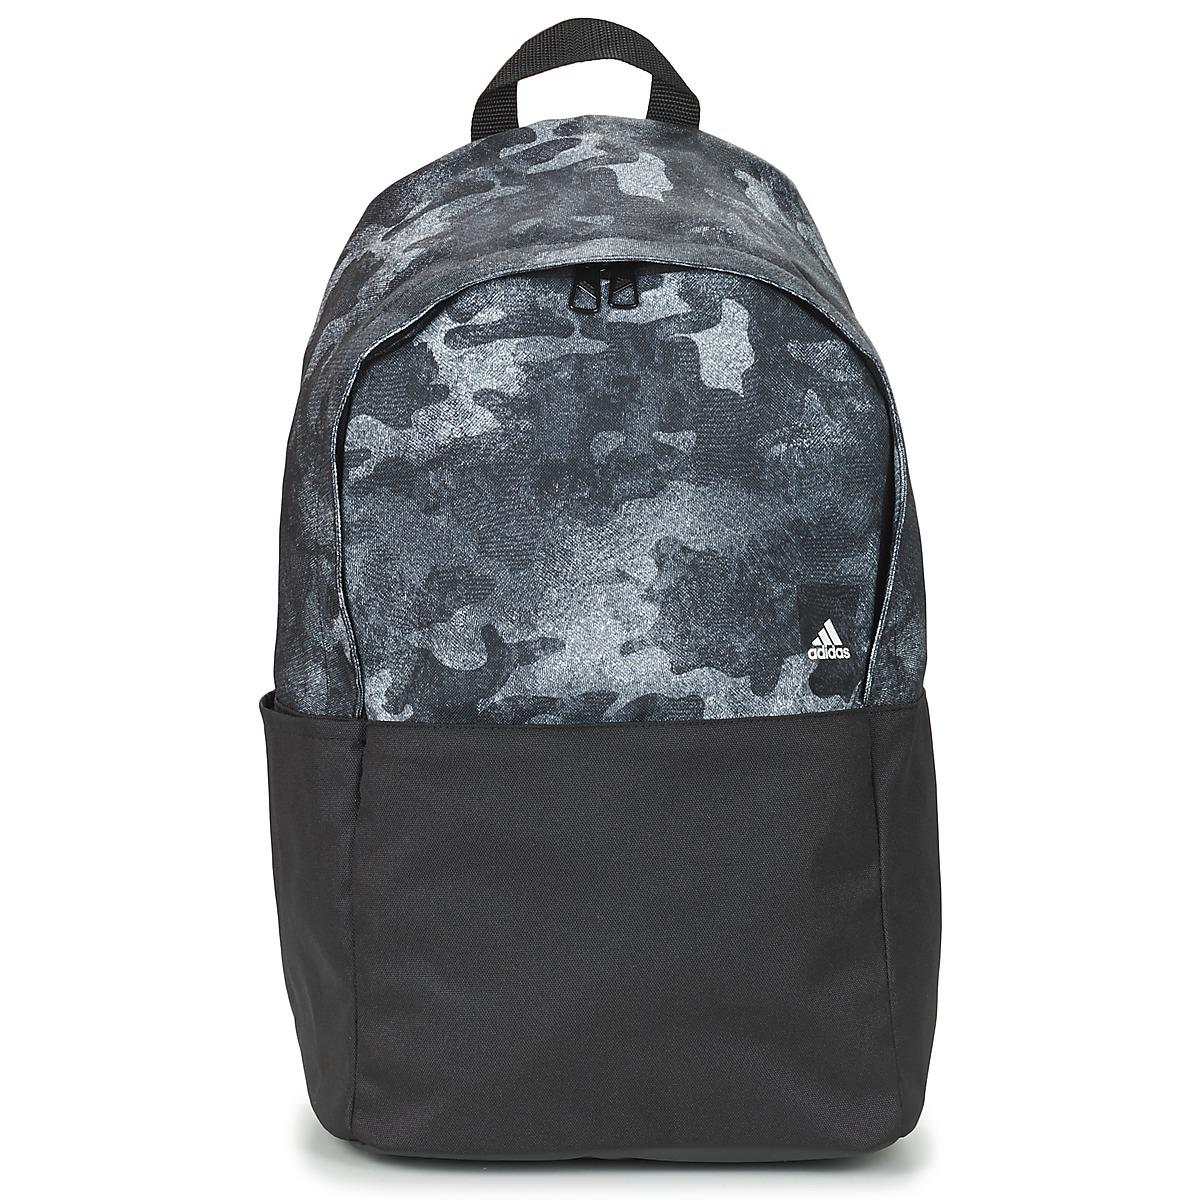 4416655f894 Adidas Classic Bp Men s Backpack In Black in Black for Men - Lyst